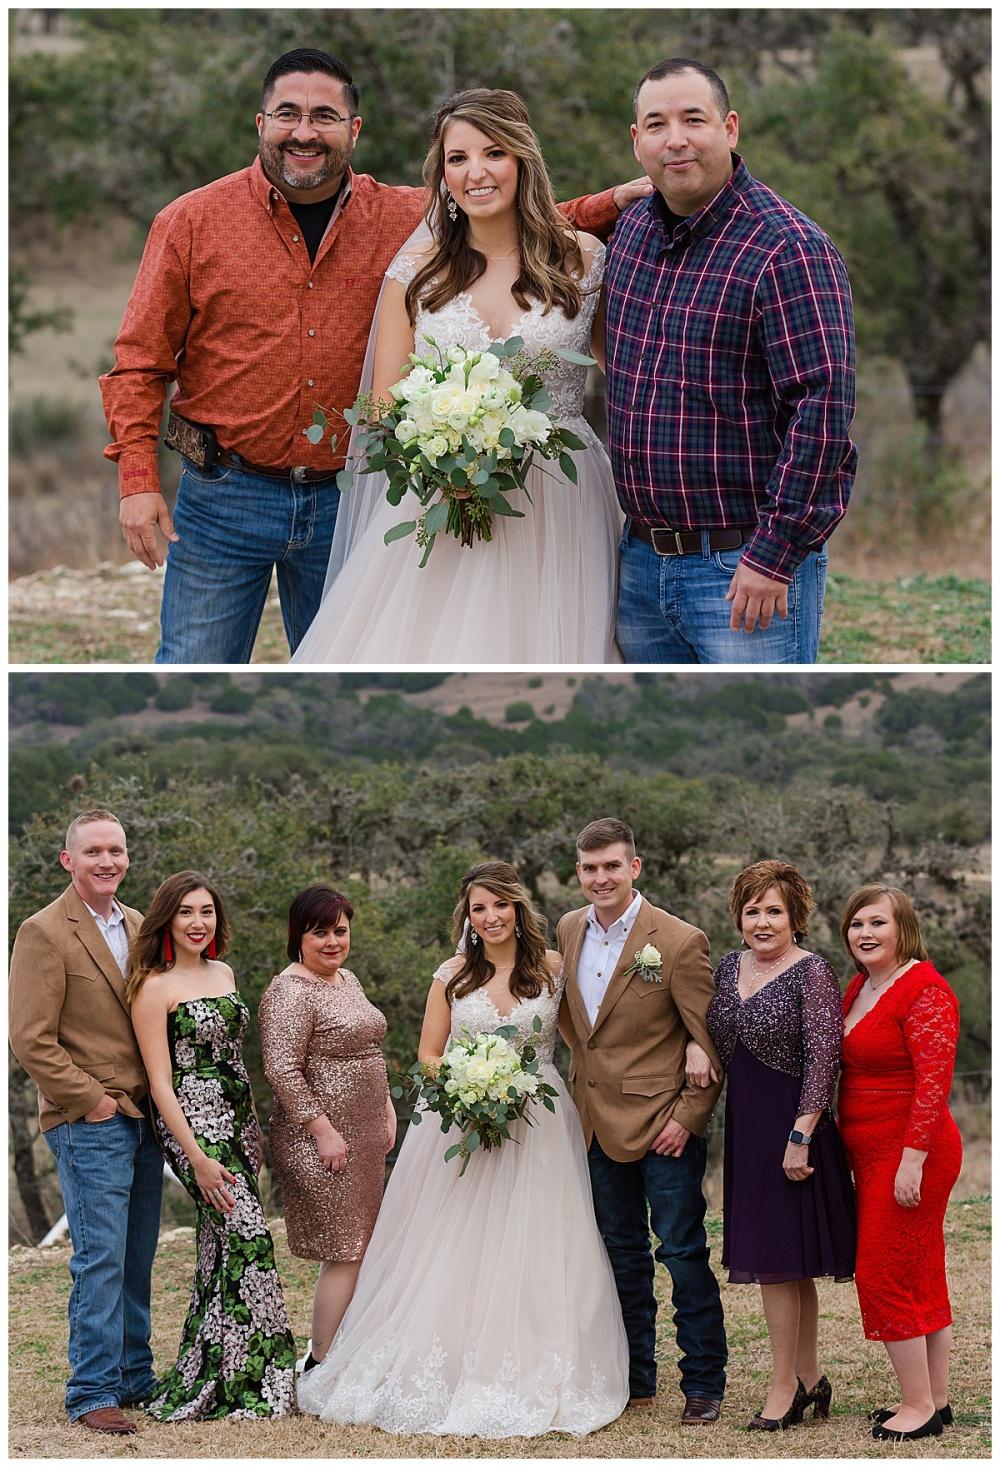 Wedding-Photographer-Texas-Hill-Country-Happy-H-Ranch-Comfor-Texas-Carly-Barton-Photography_0037.jpg